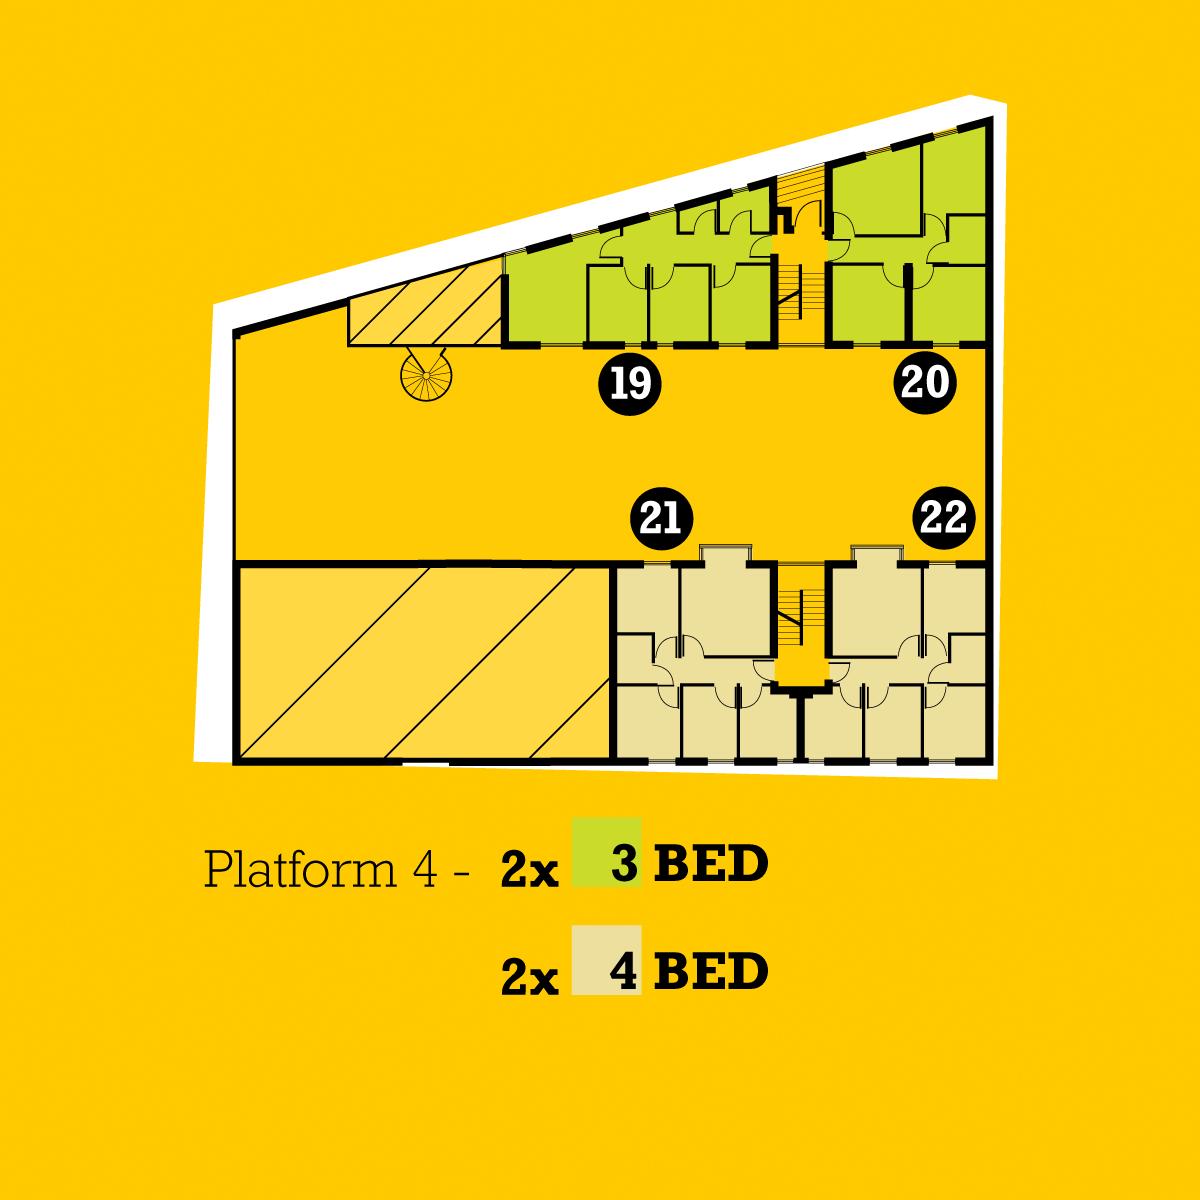 The Platform plans floor 4